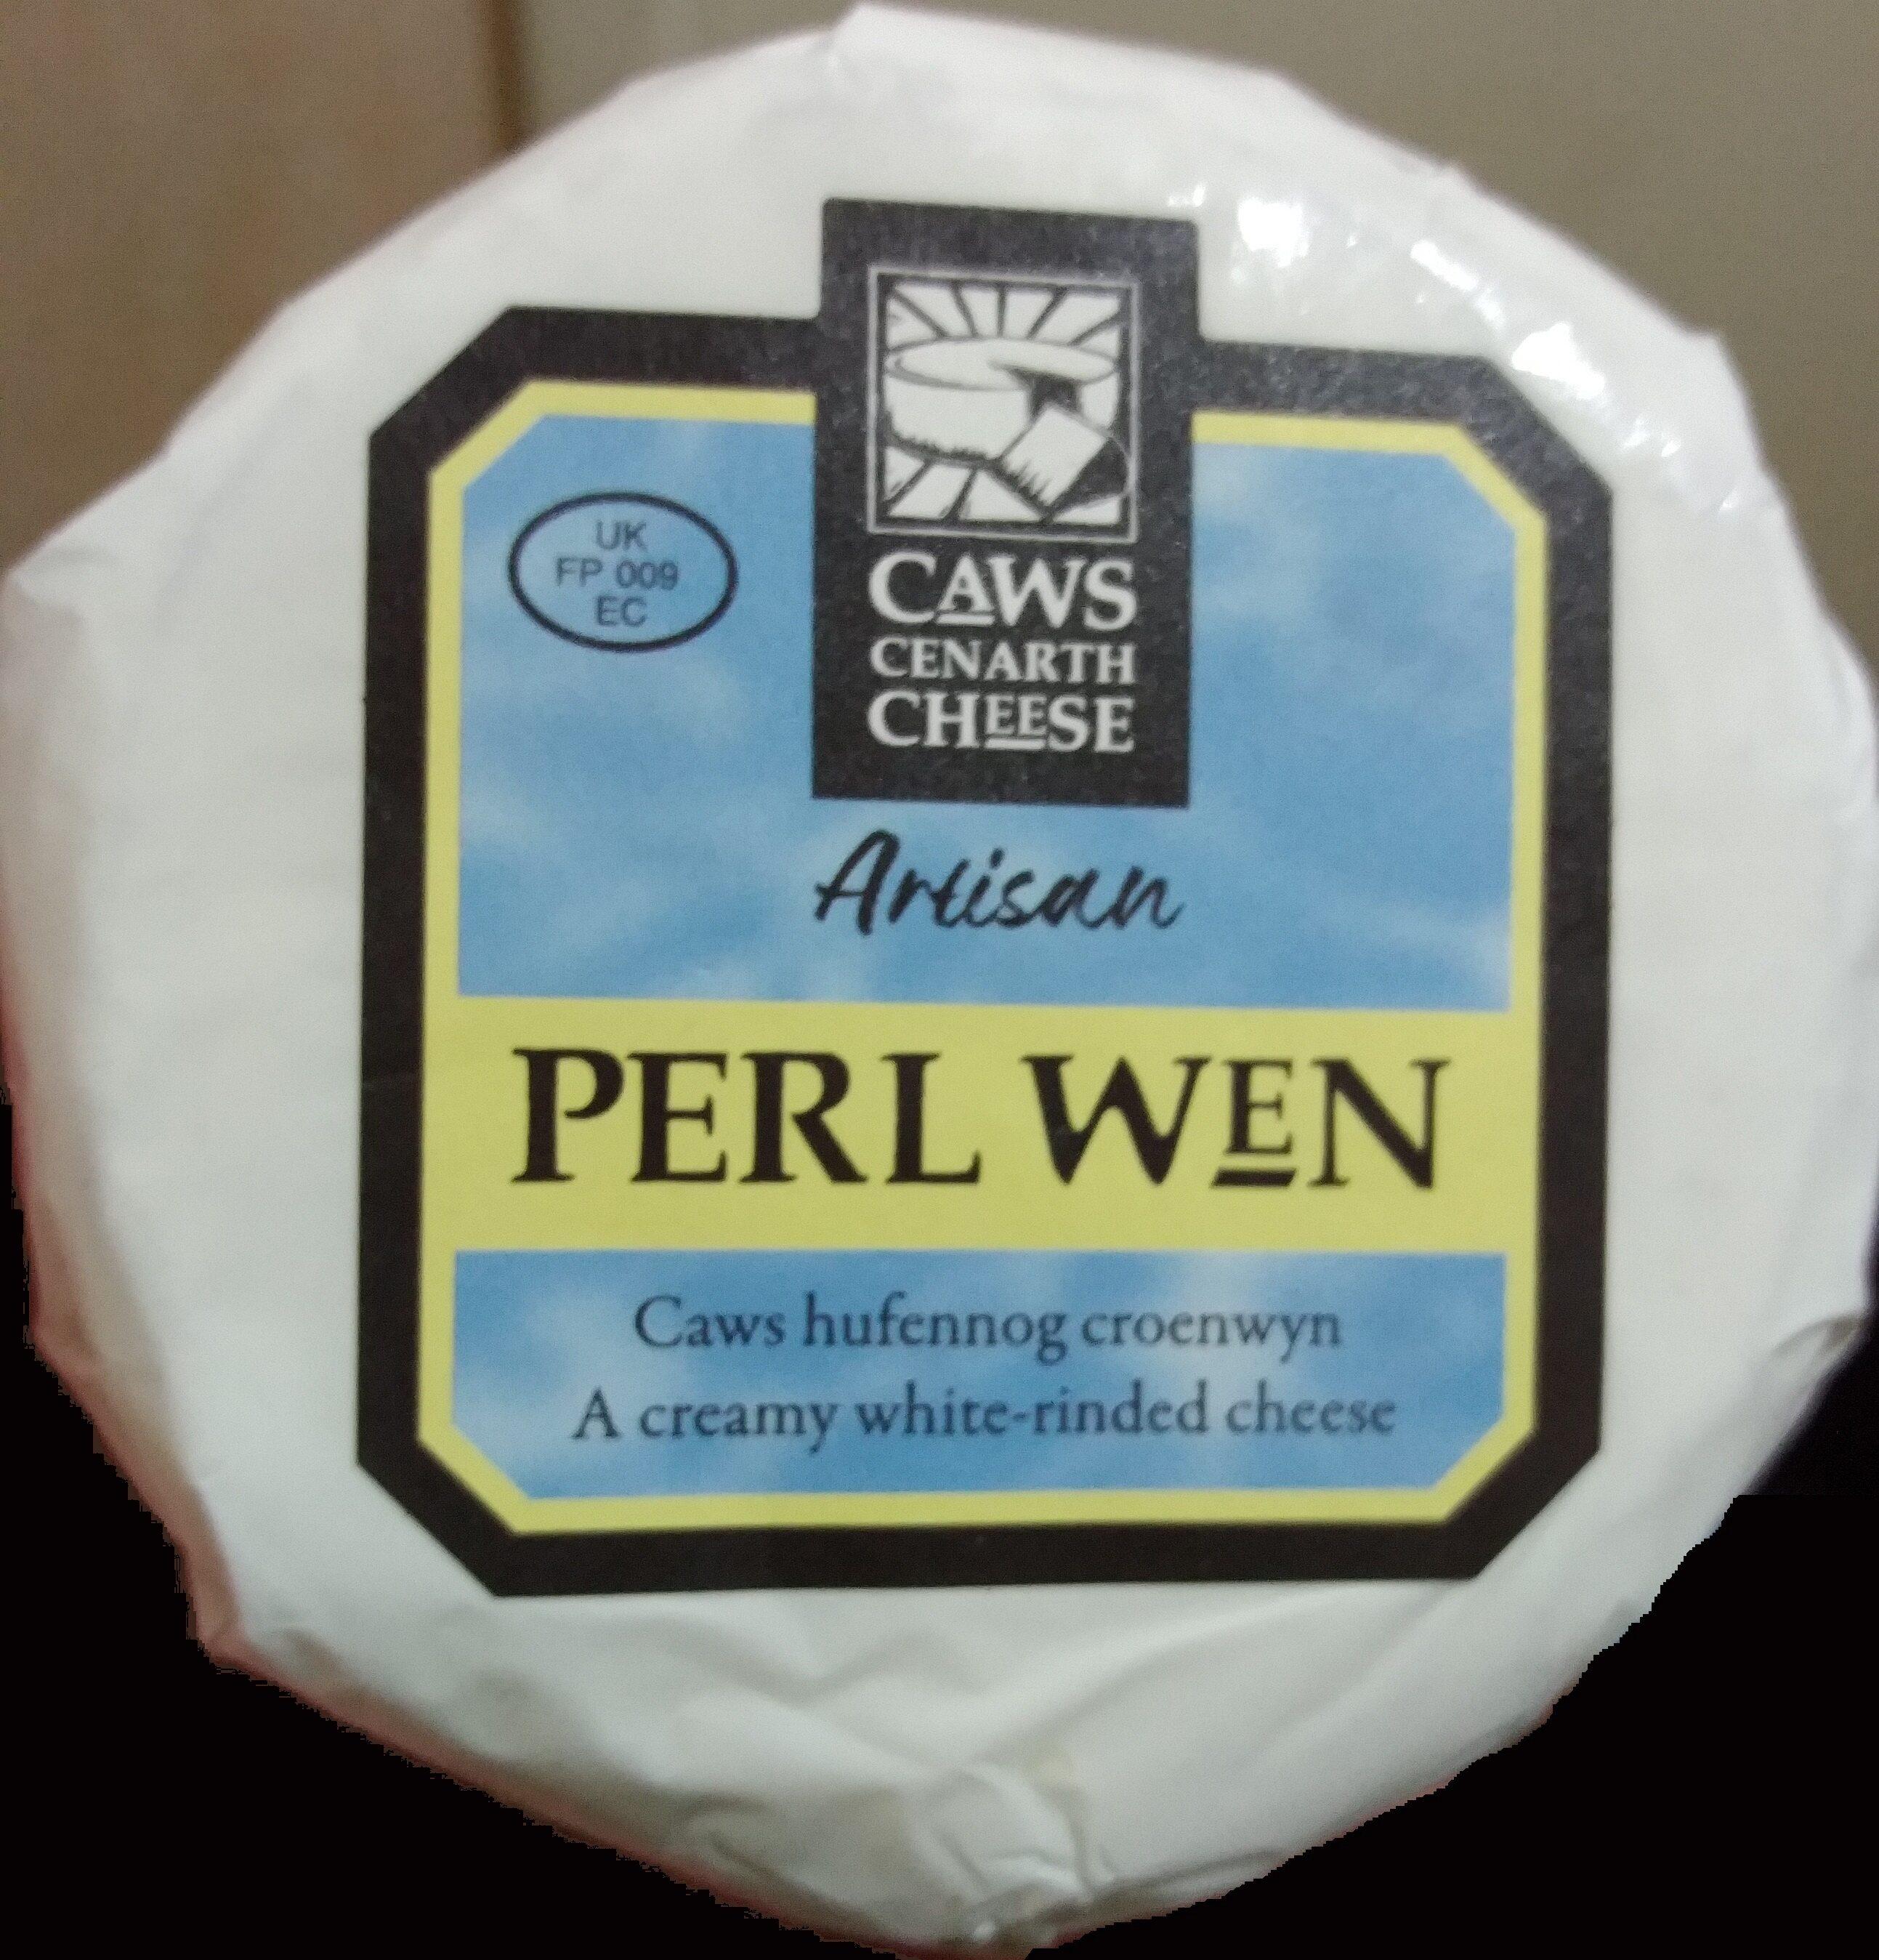 Artisan Perl Wen - Product - en